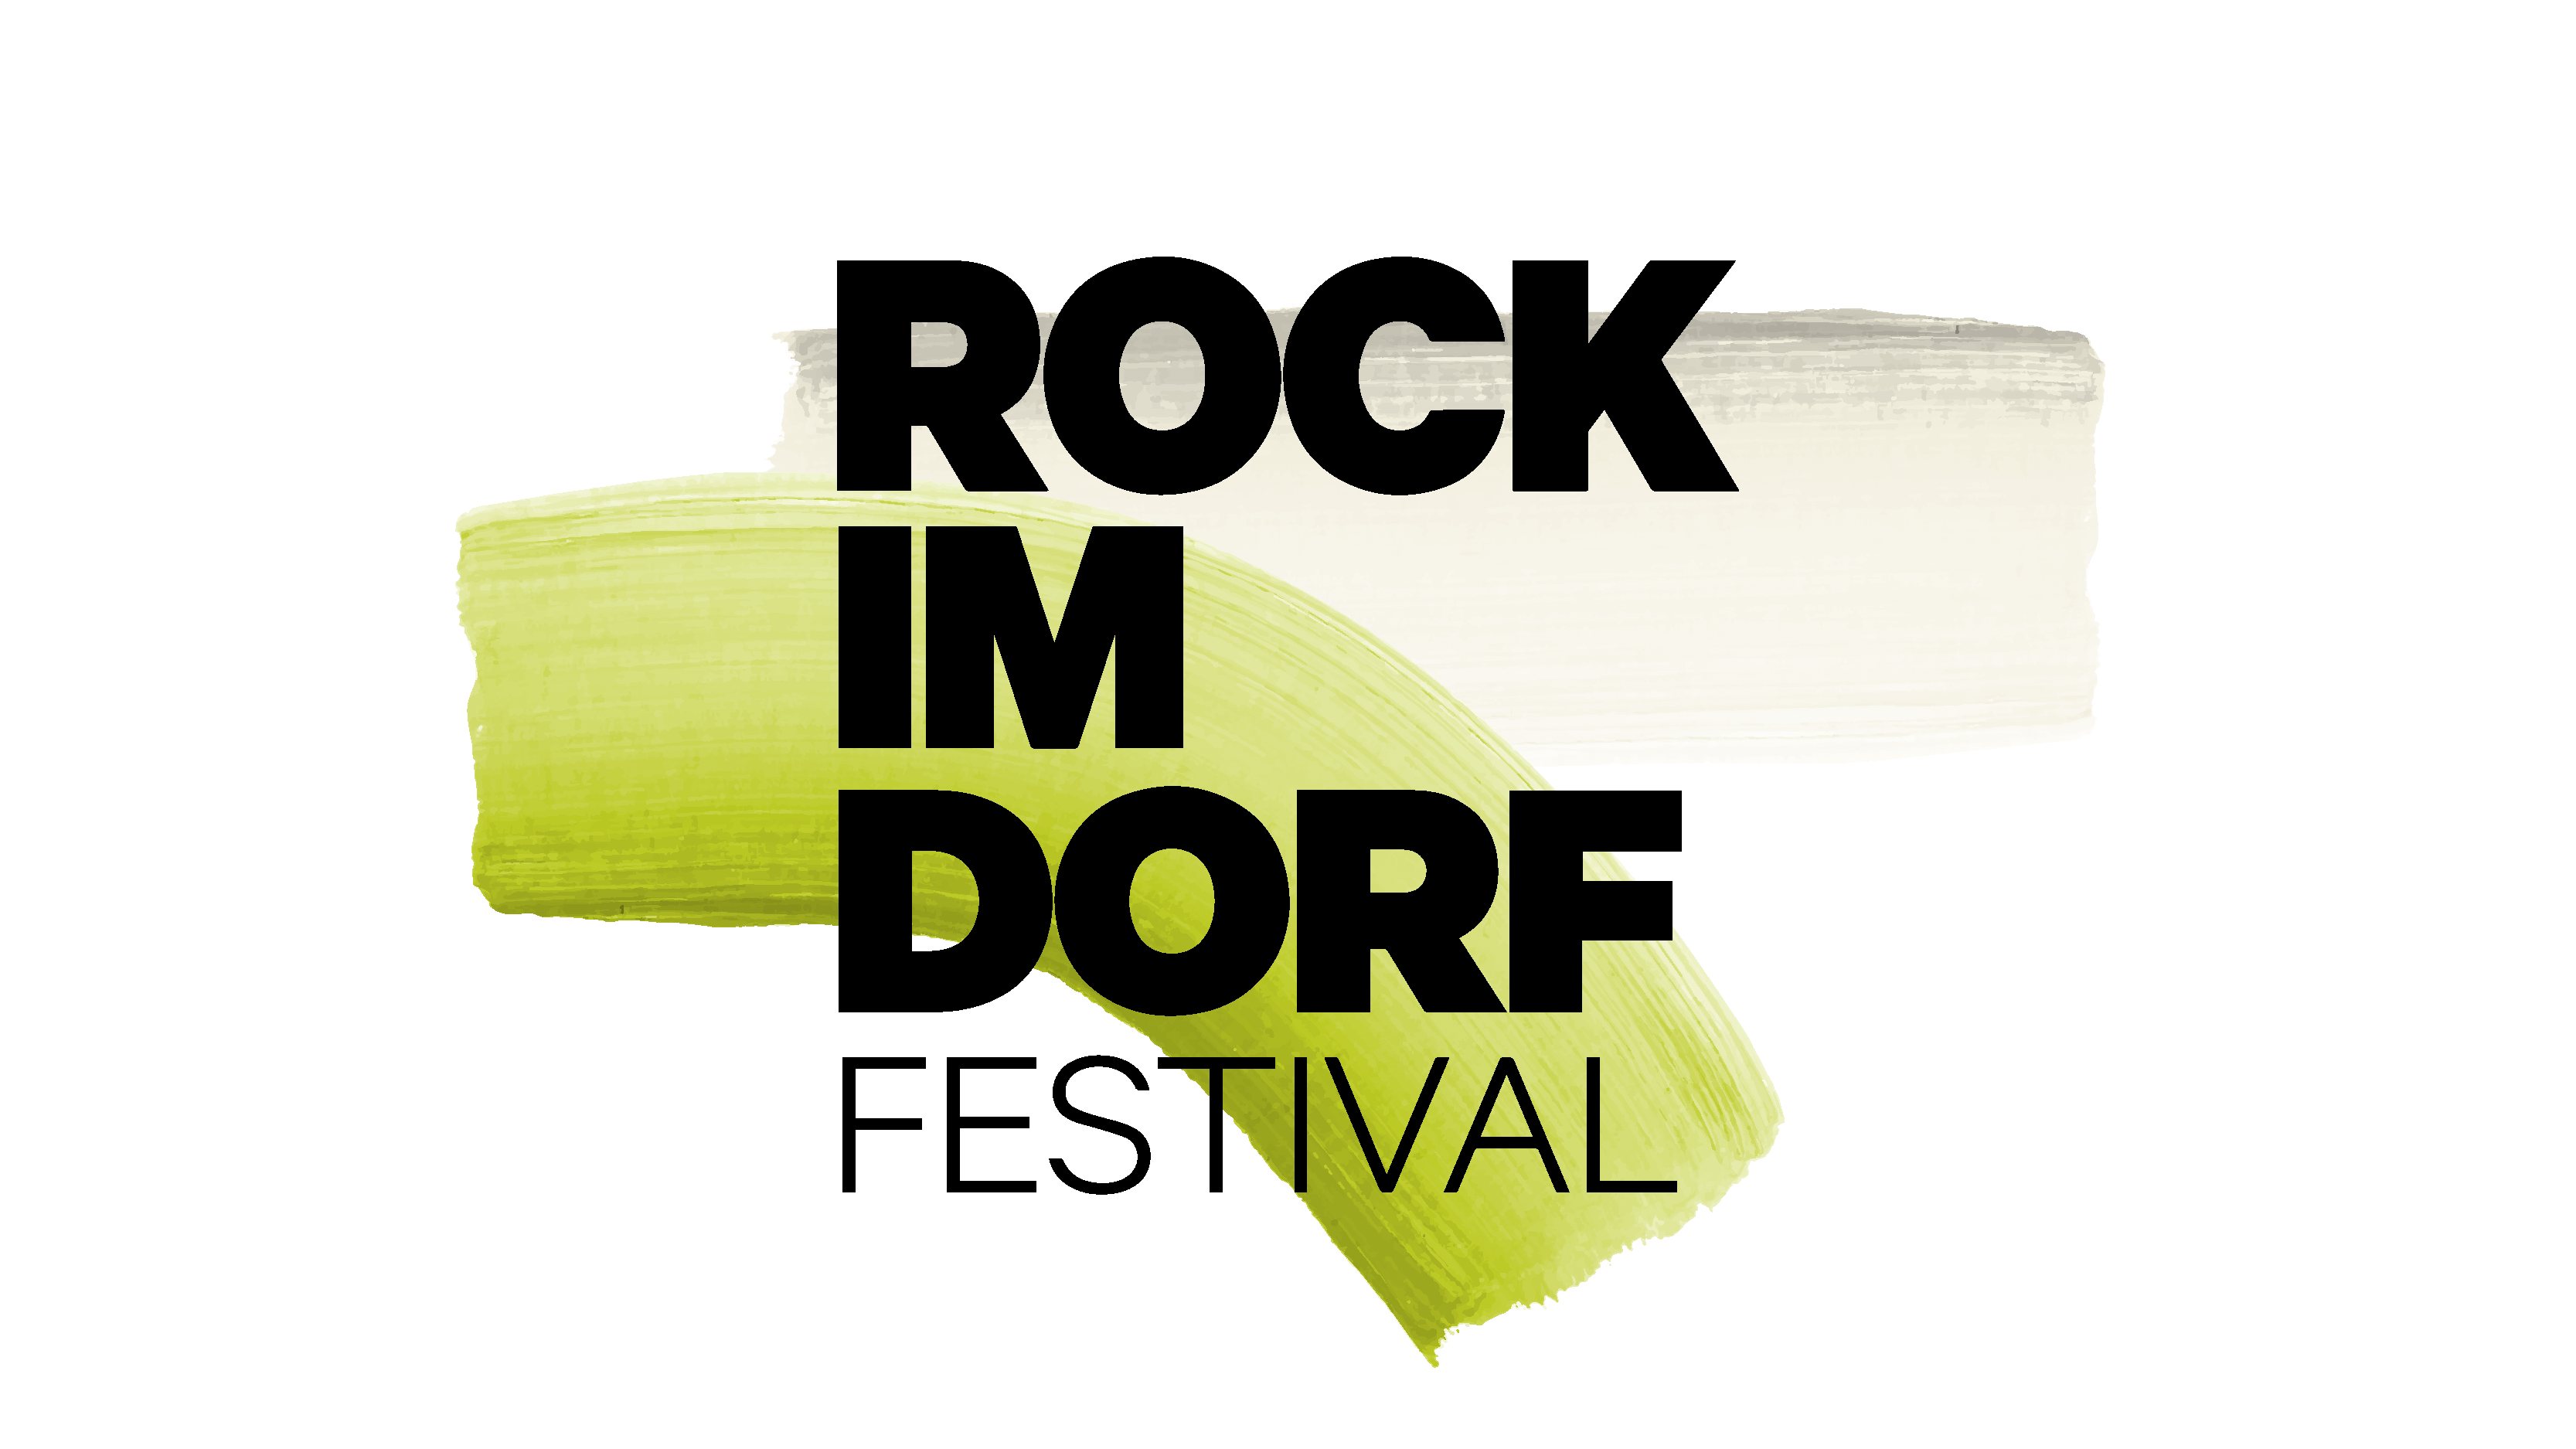 Logo Rock im Dorf Festival 2022